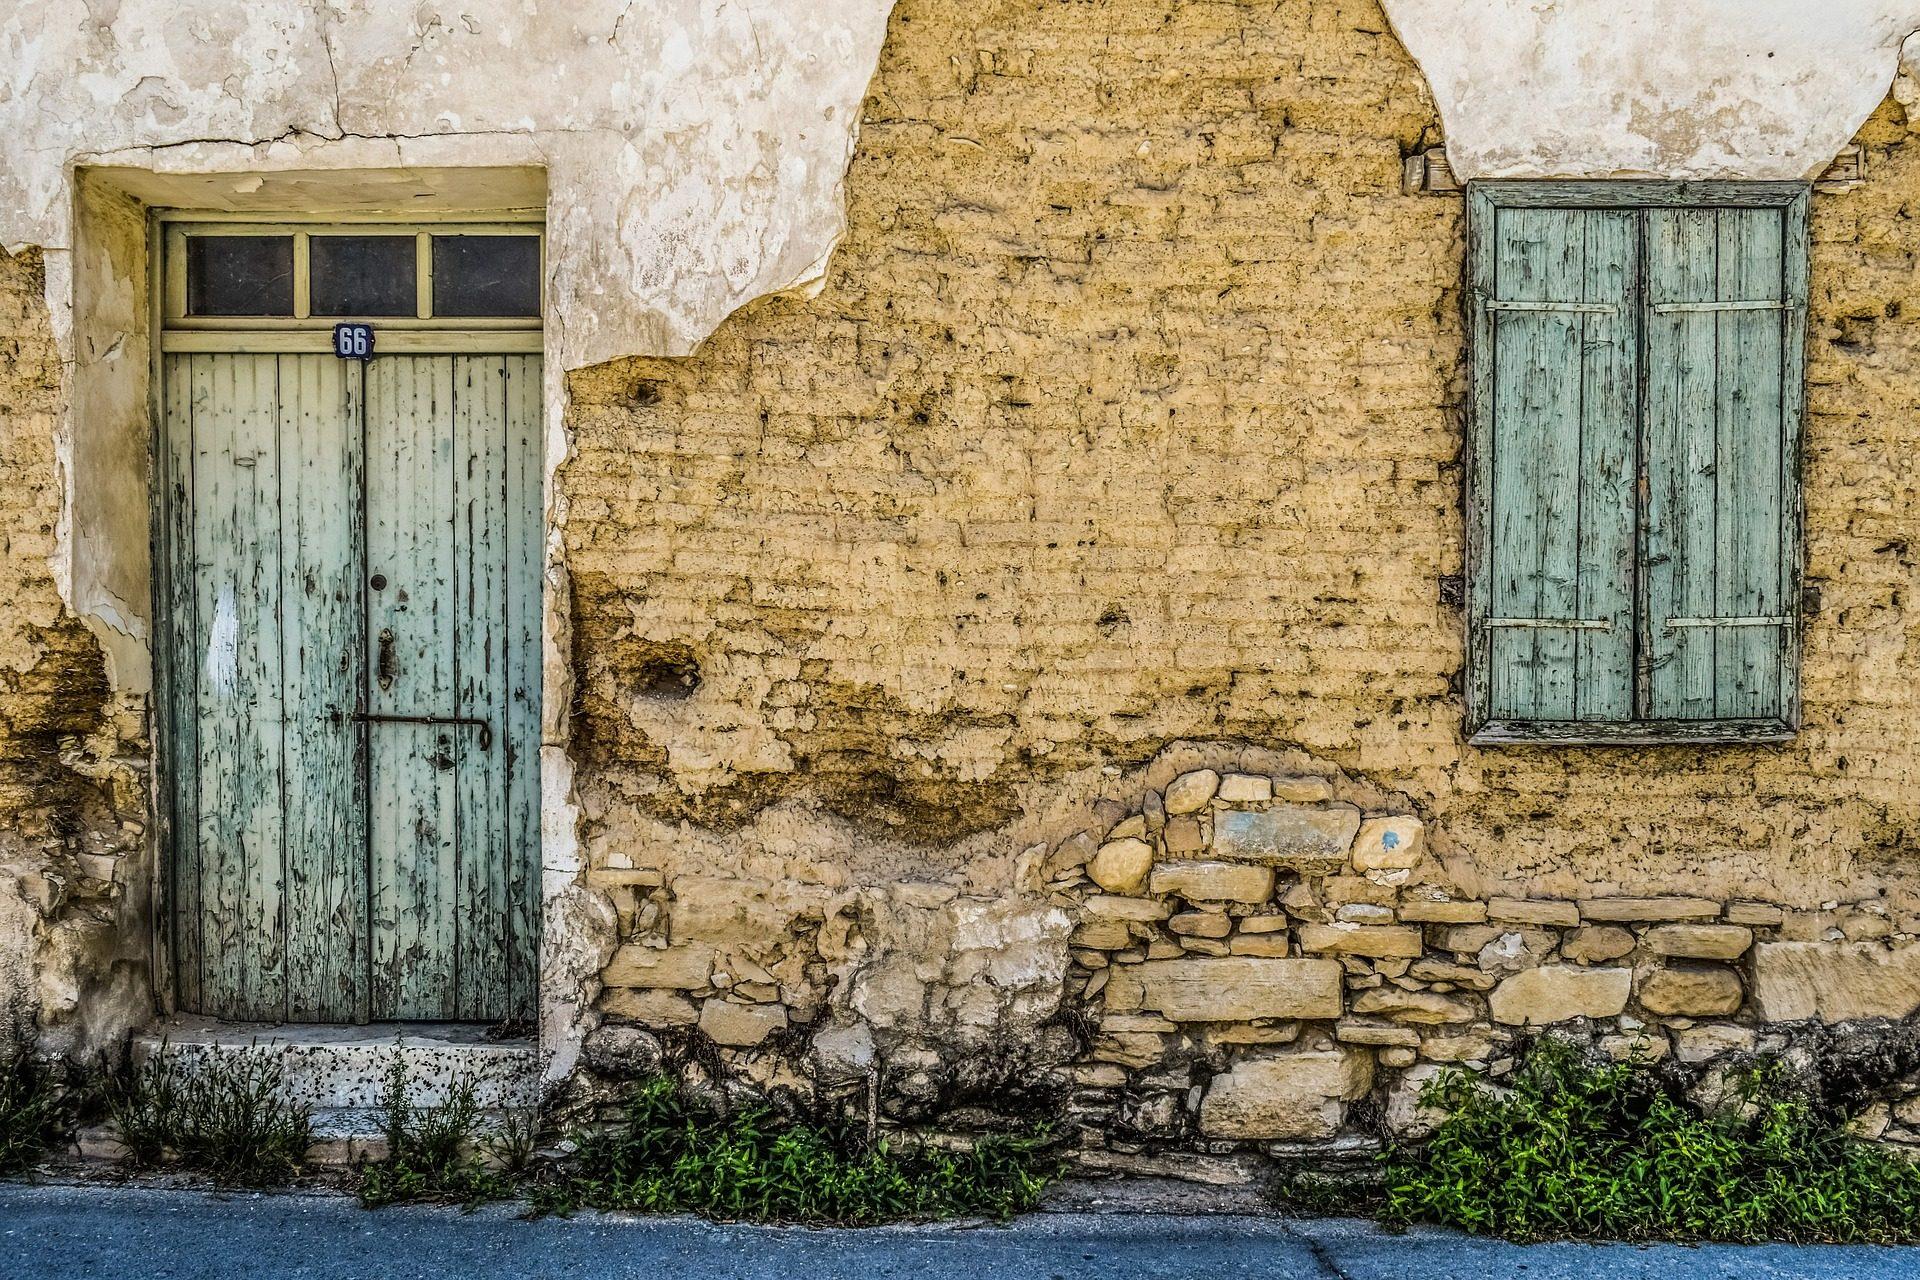 Haus, antigua, alt, aufgegeben, Tür, Fenster - Wallpaper HD - Prof.-falken.com